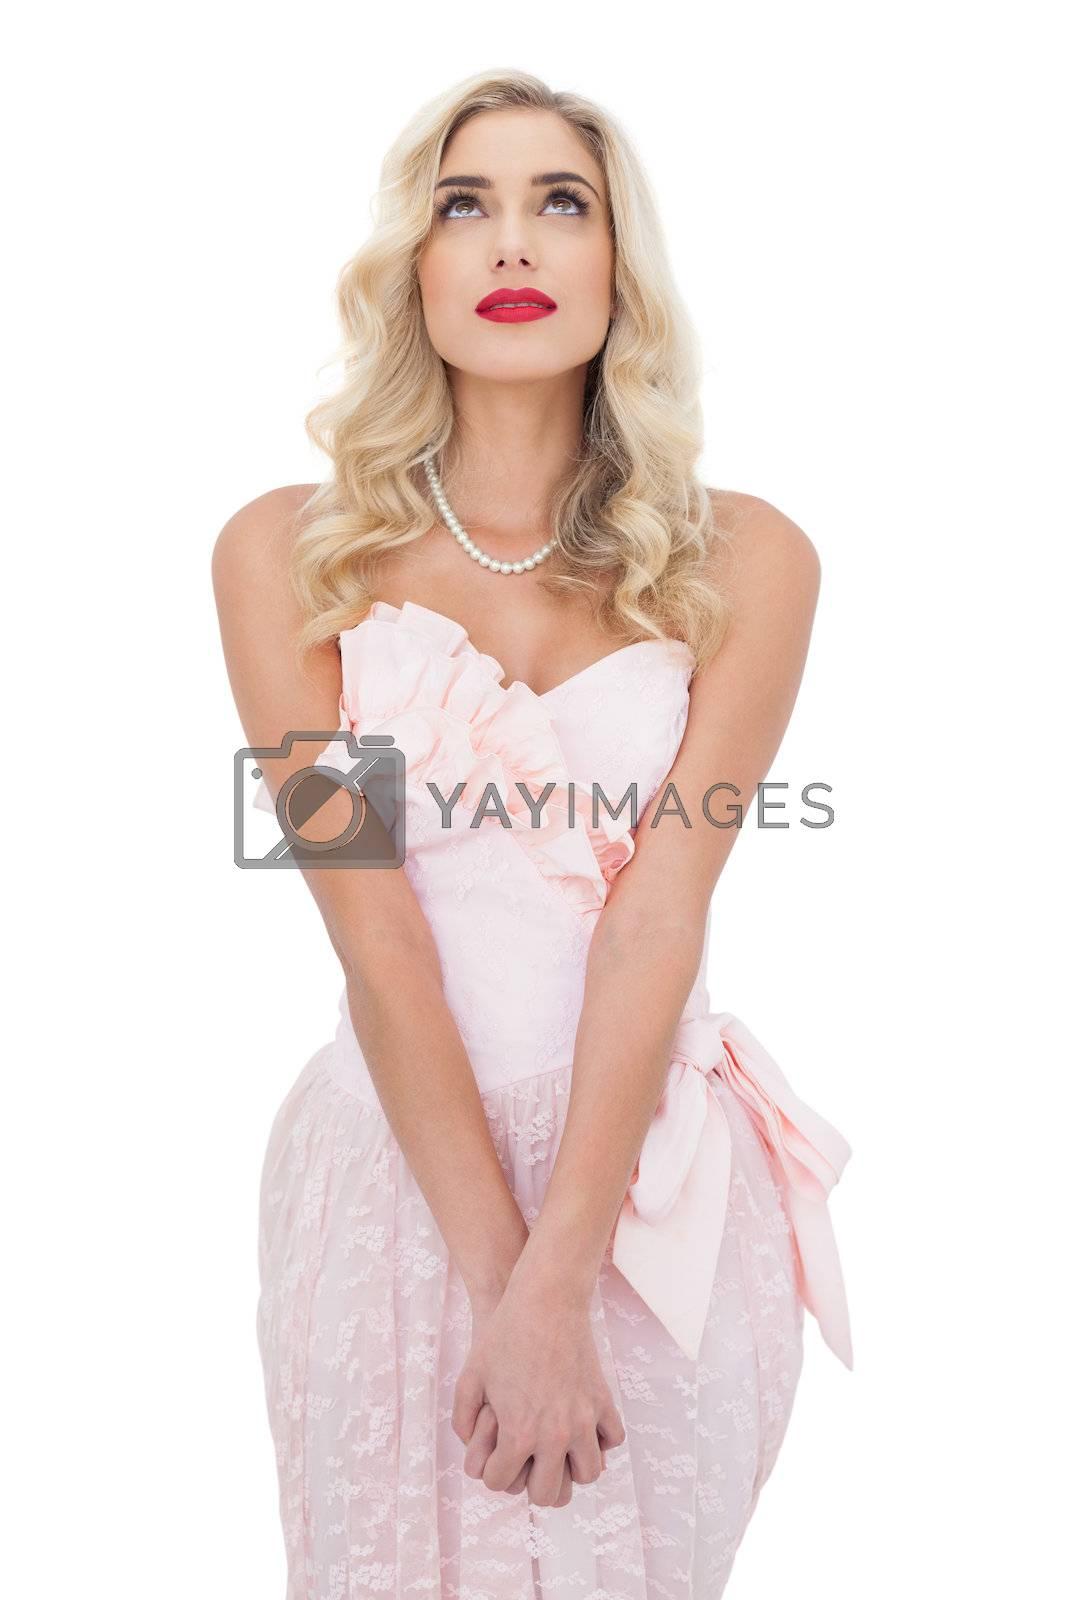 Wondering blonde model in pink dress posing holding hands and looking up by Wavebreakmedia